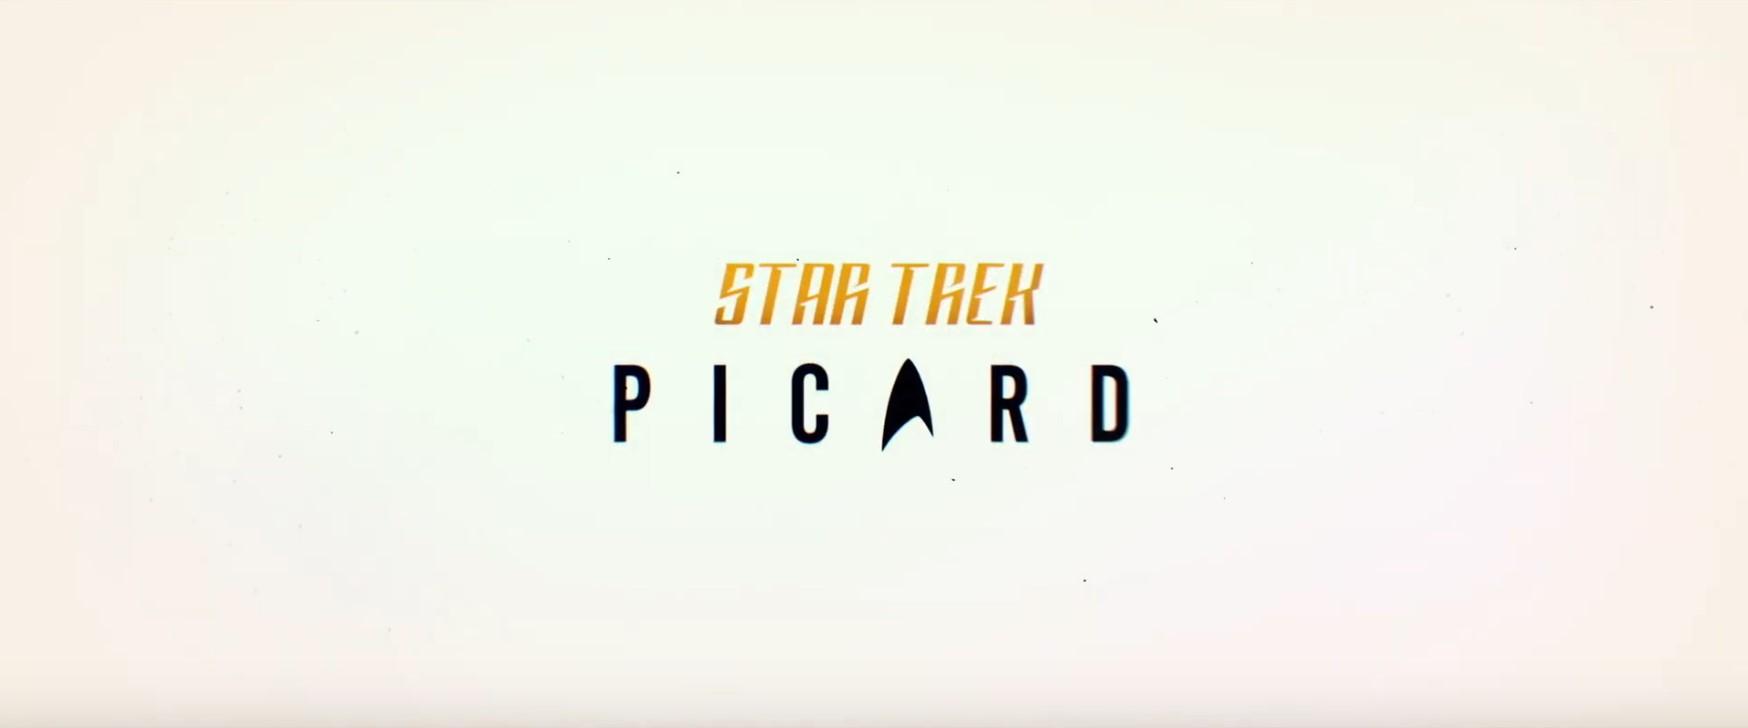 <i>Picard</i> title card